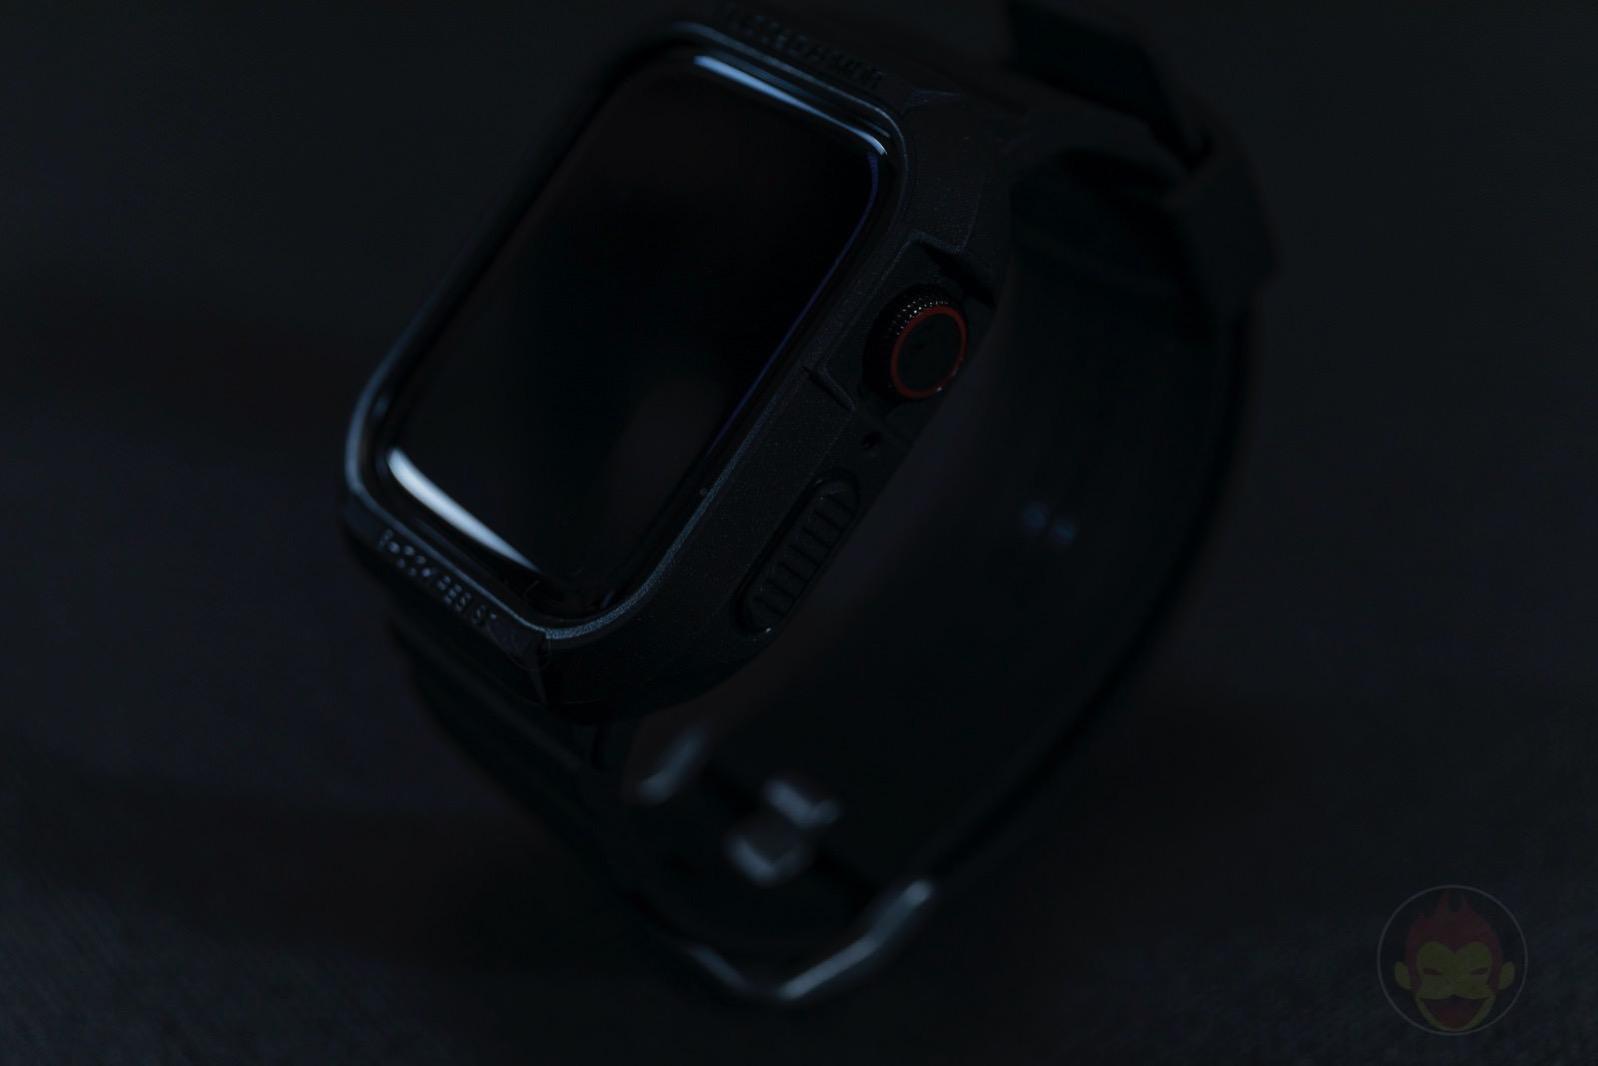 Spigen-Rugged-Armor-Pro-Apple-Watch-Band-and-case-03.jpg